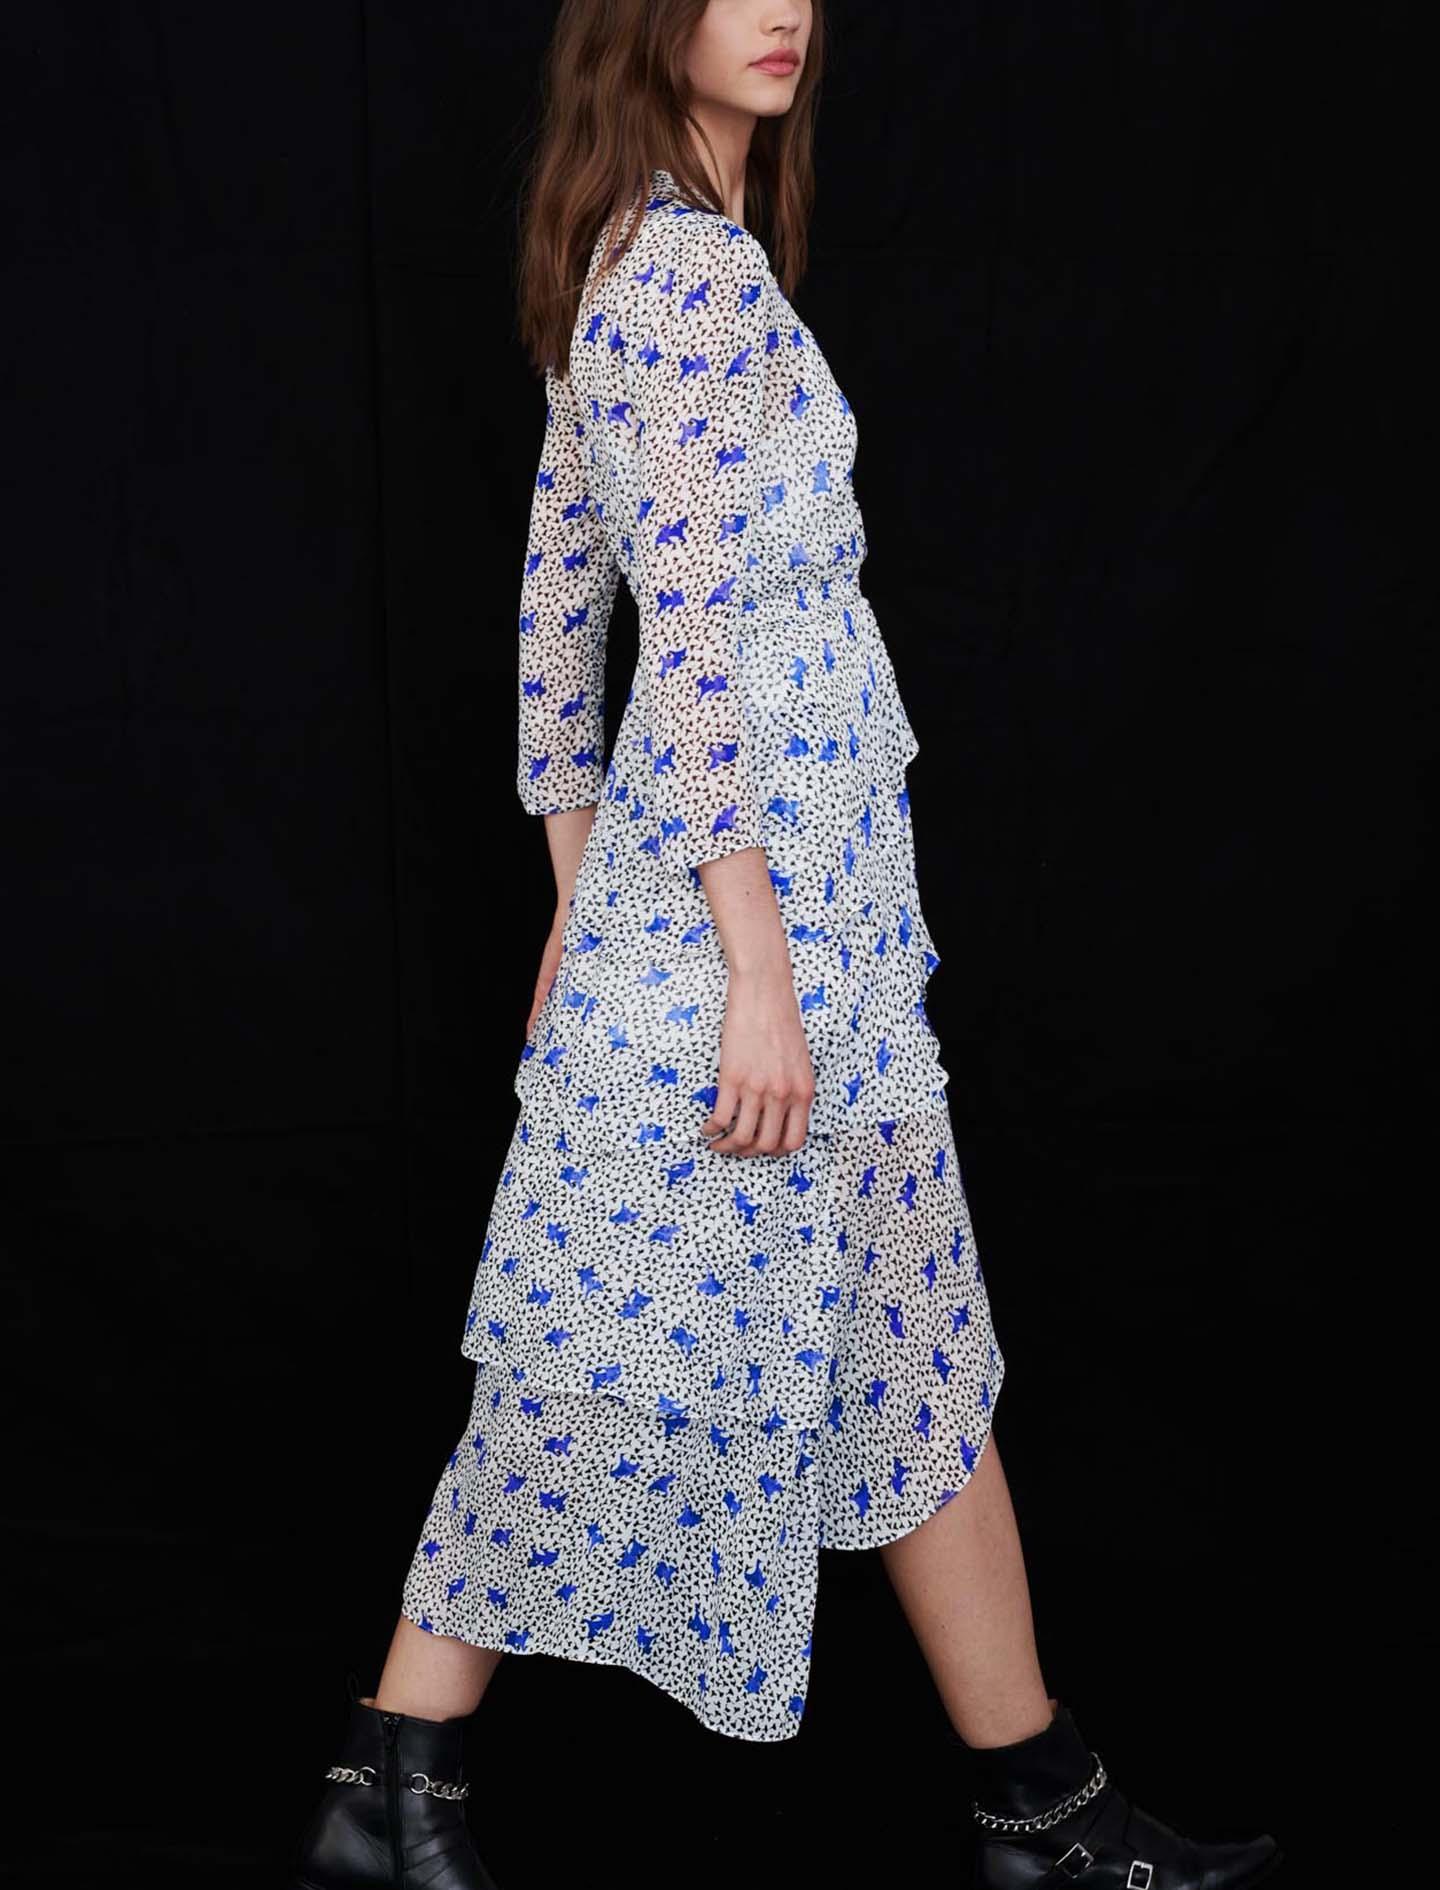 21SS 마쥬 언발 러플 원피스 (손담비 착용) MAJE 221RENCALA Asymmetric dress in printed muslin